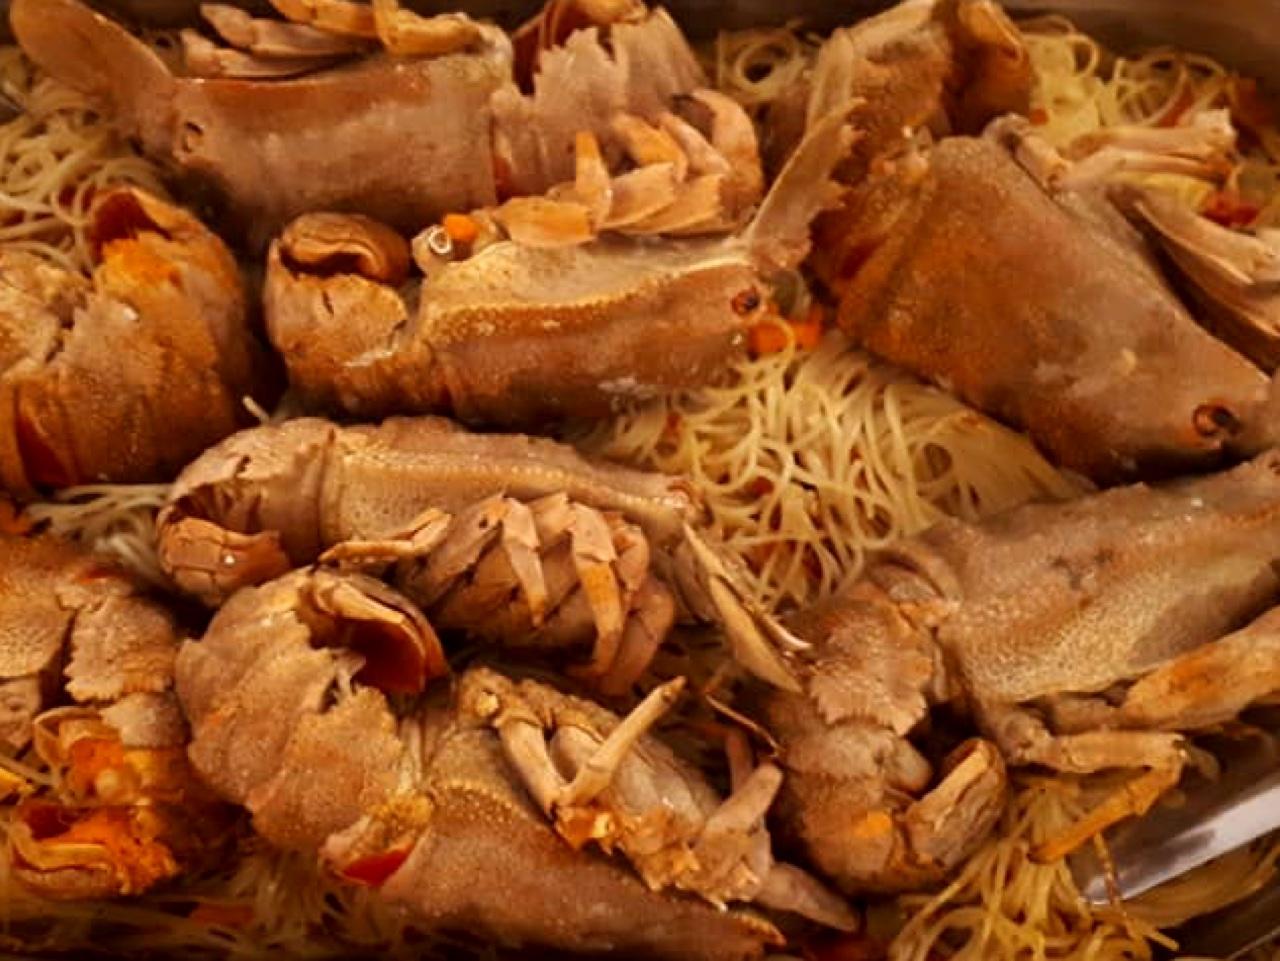 taverna psaropoula koutsounari, psaropoula taverna east crete, psaropoula tavern eatery ierapetra, where to eat ierapetra crete, best restaurants east crete